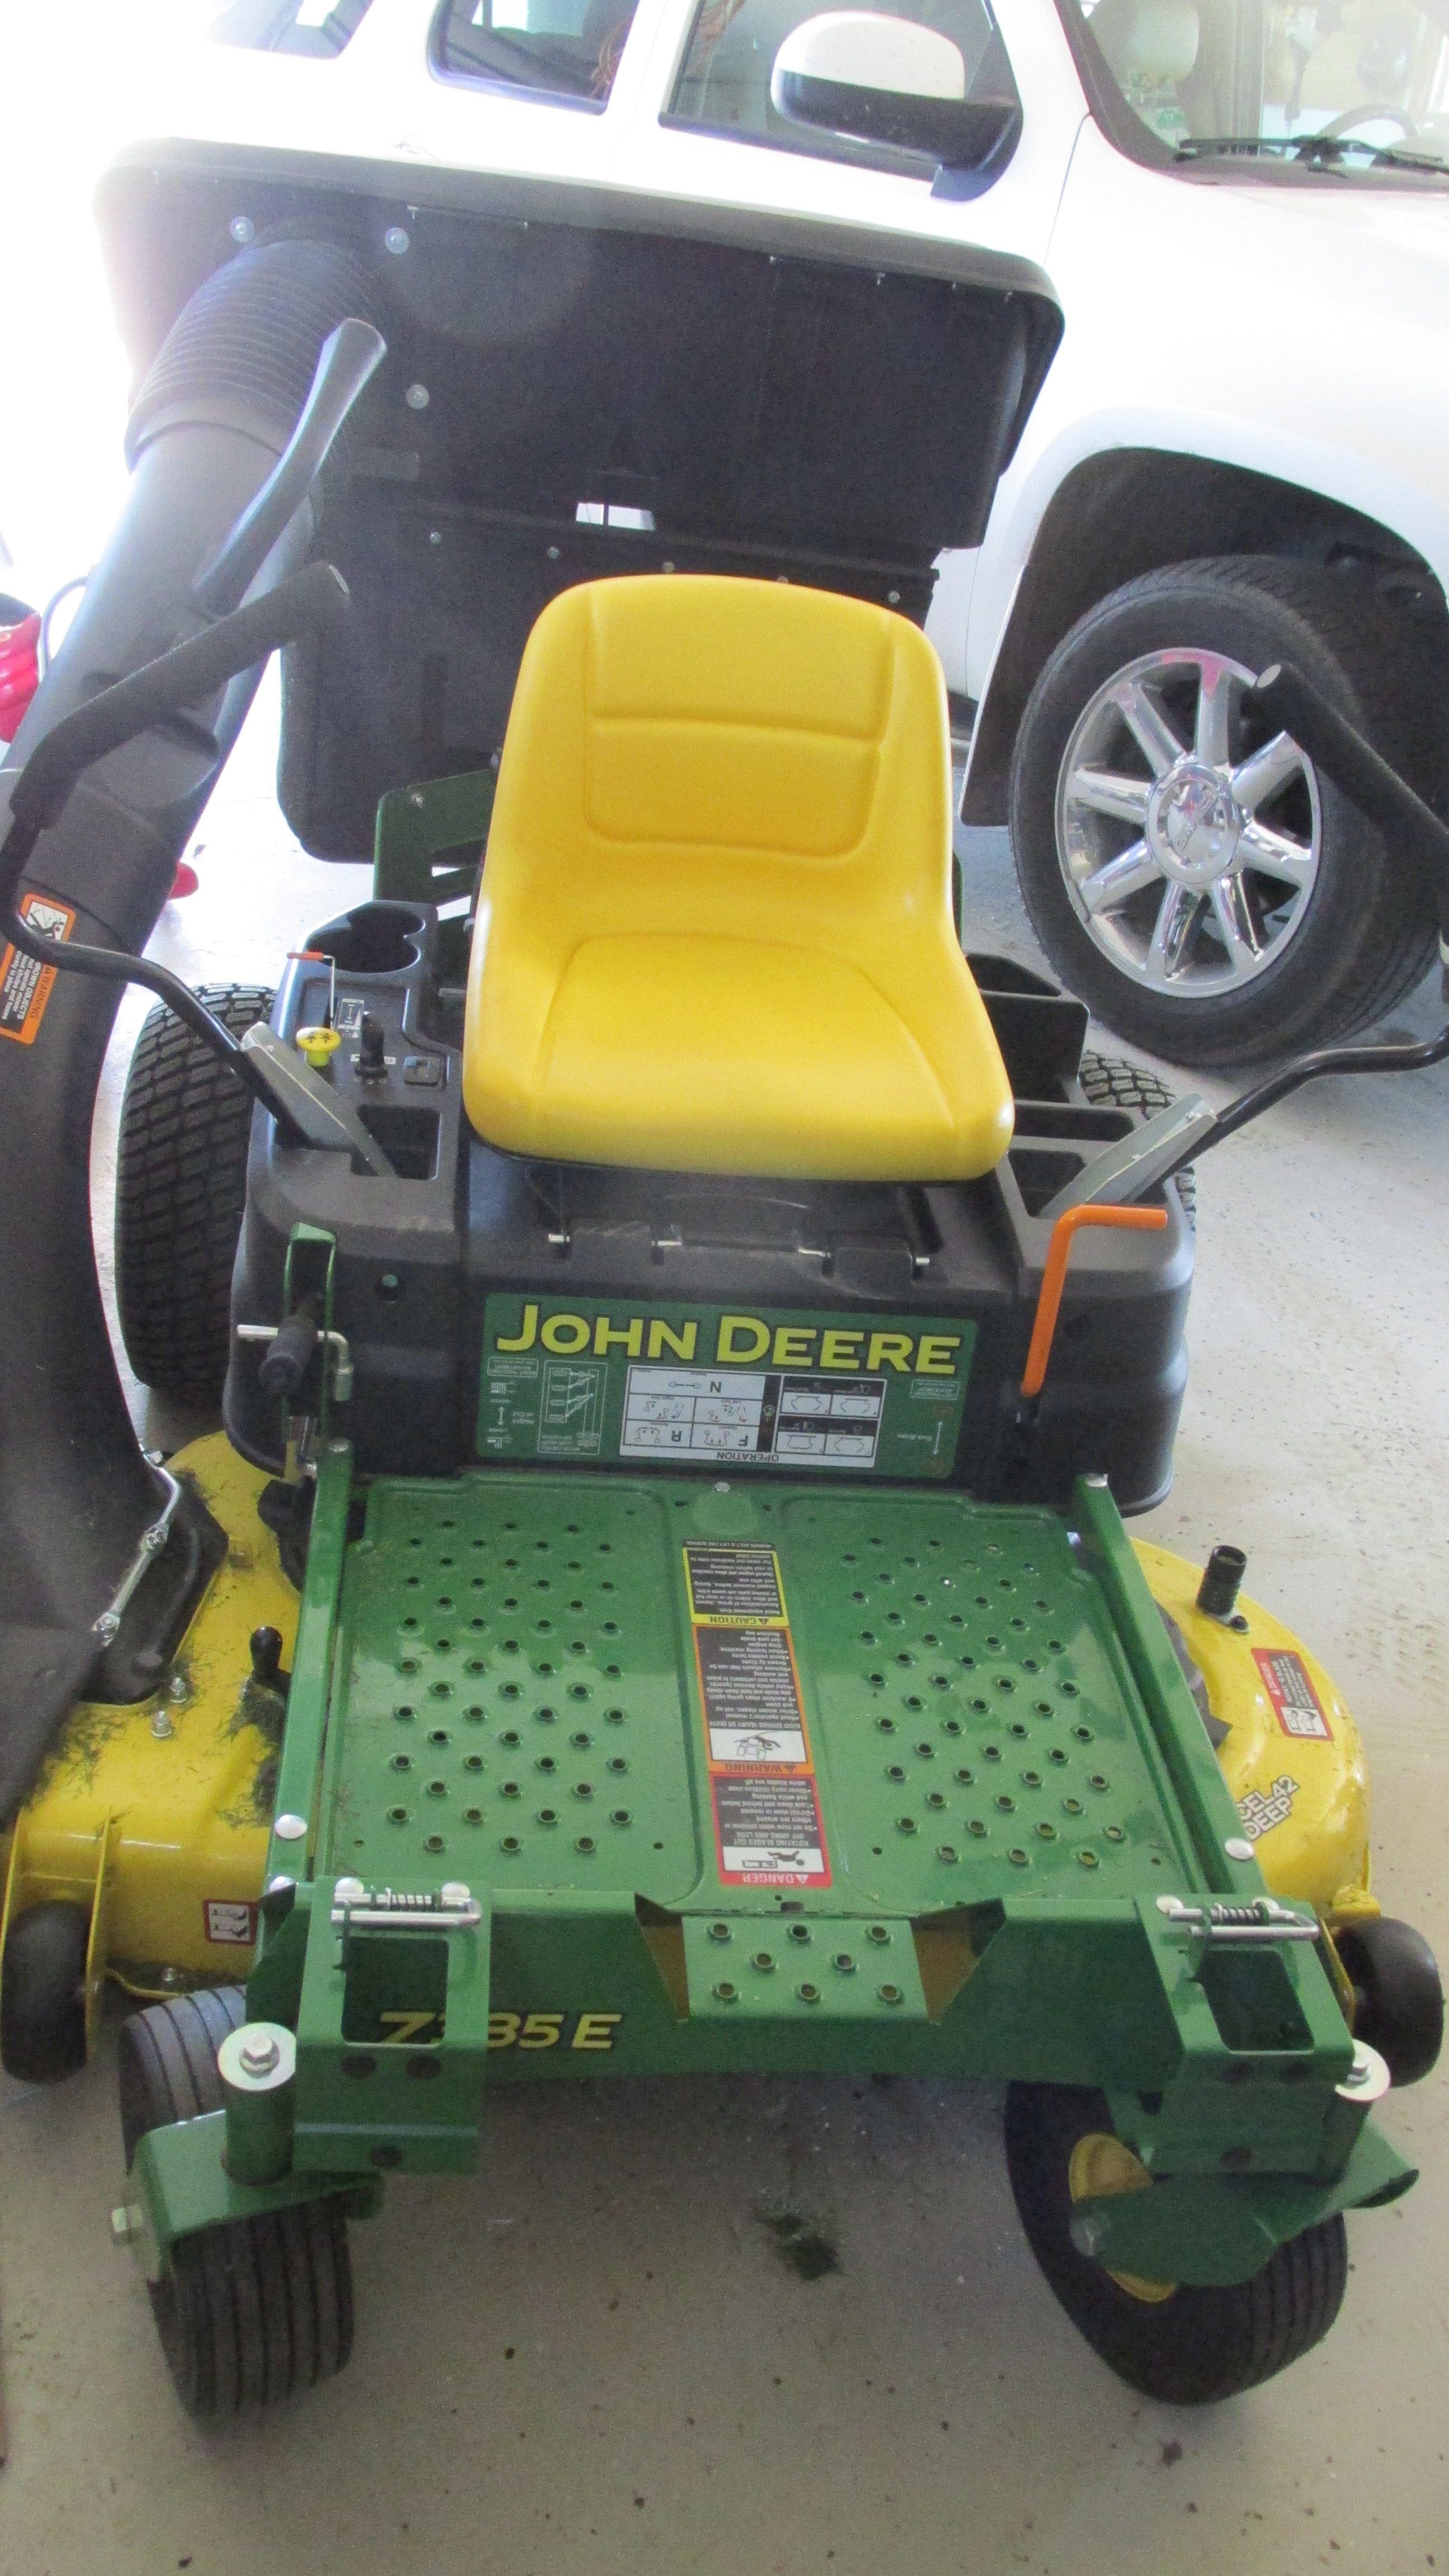 3.1 JD Mower